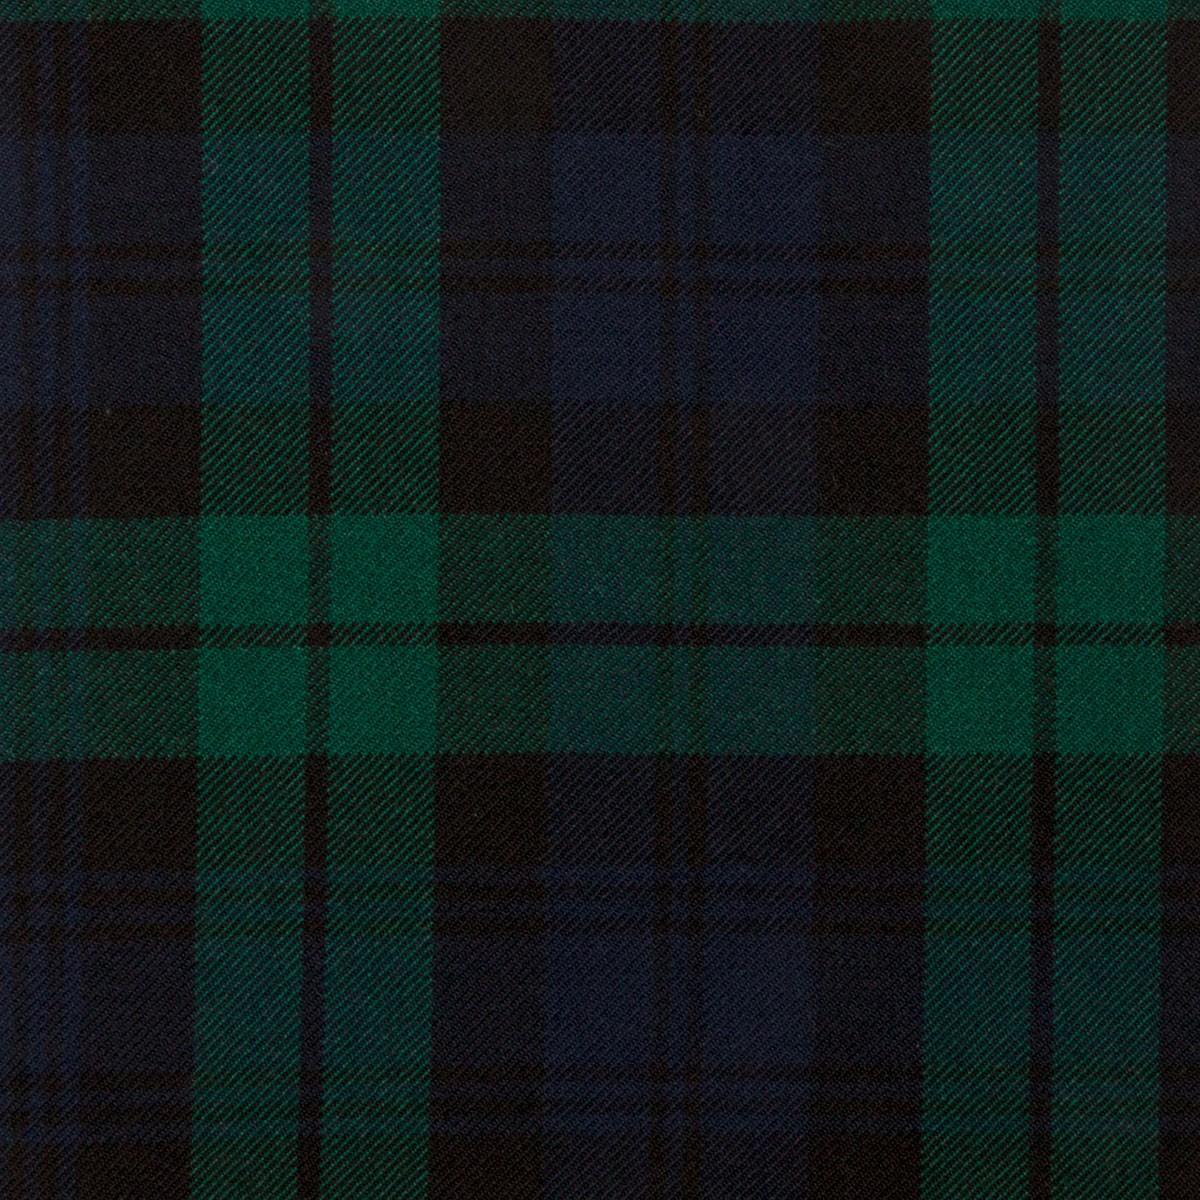 Campbell Clan Modern Heavy Weight Tartan Fabric-Front